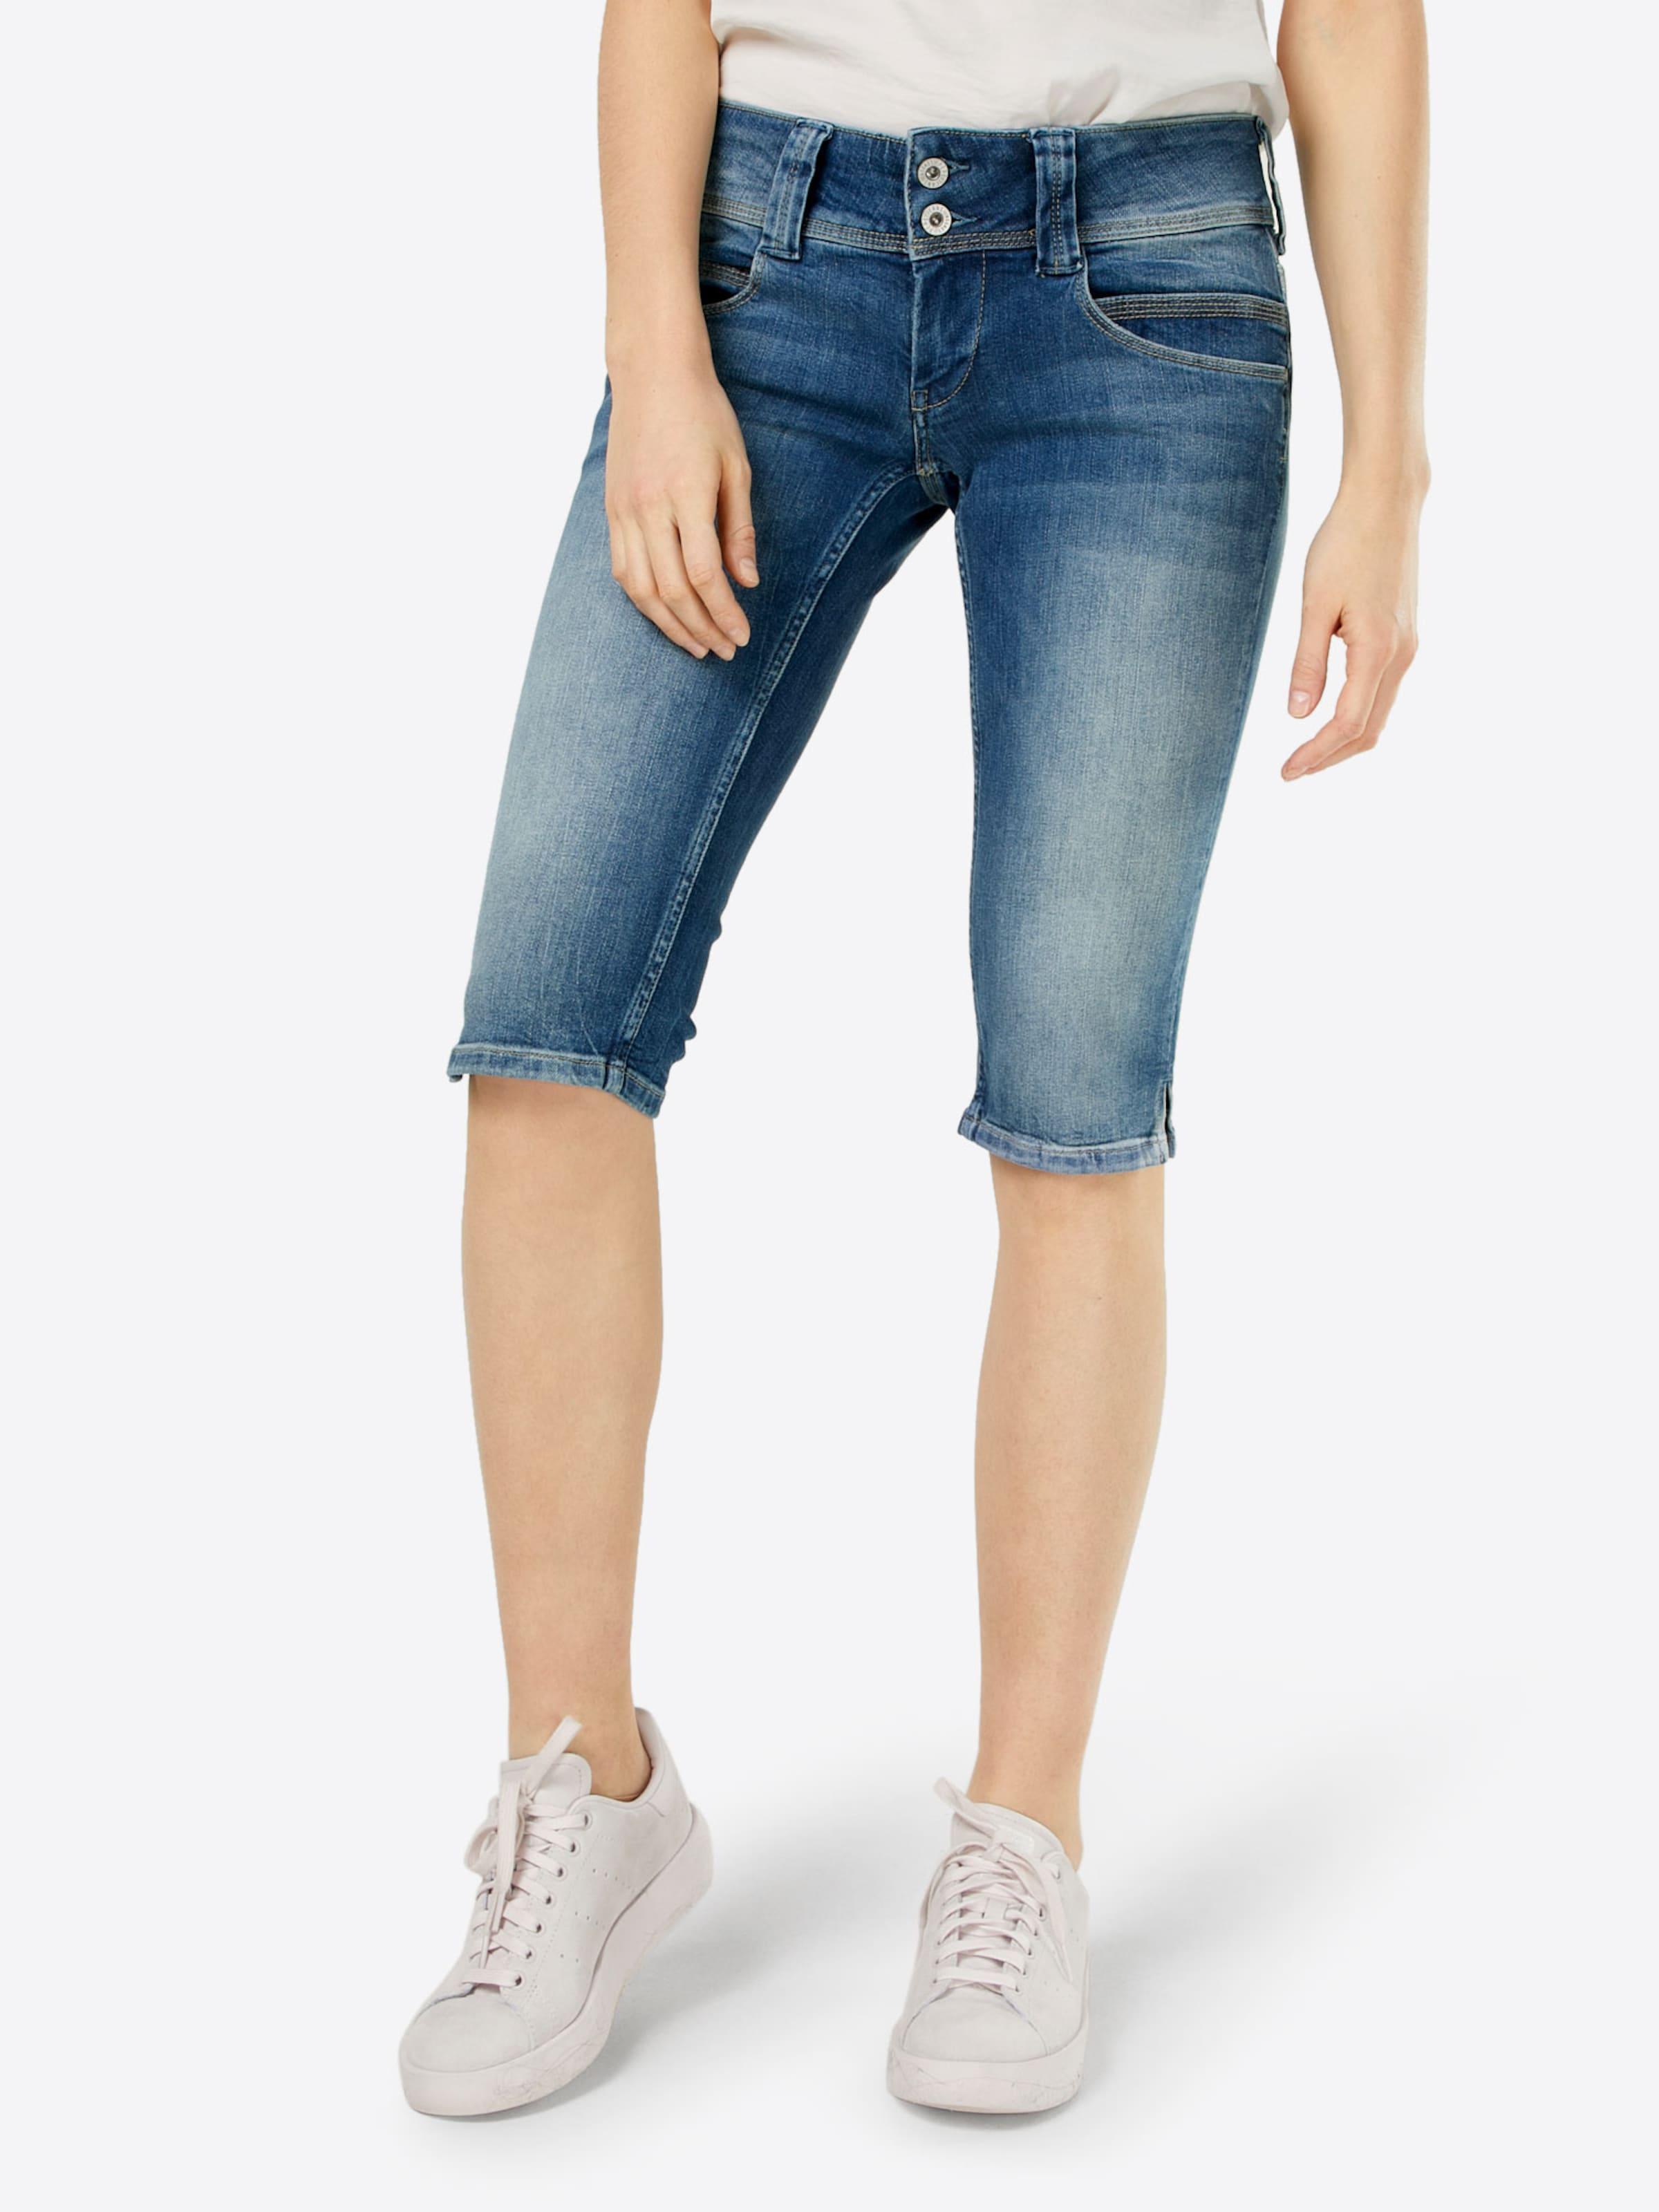 Pepe Jeans Caprijeans Jeans 'Venus' Pepe Bleached xnFZwxar